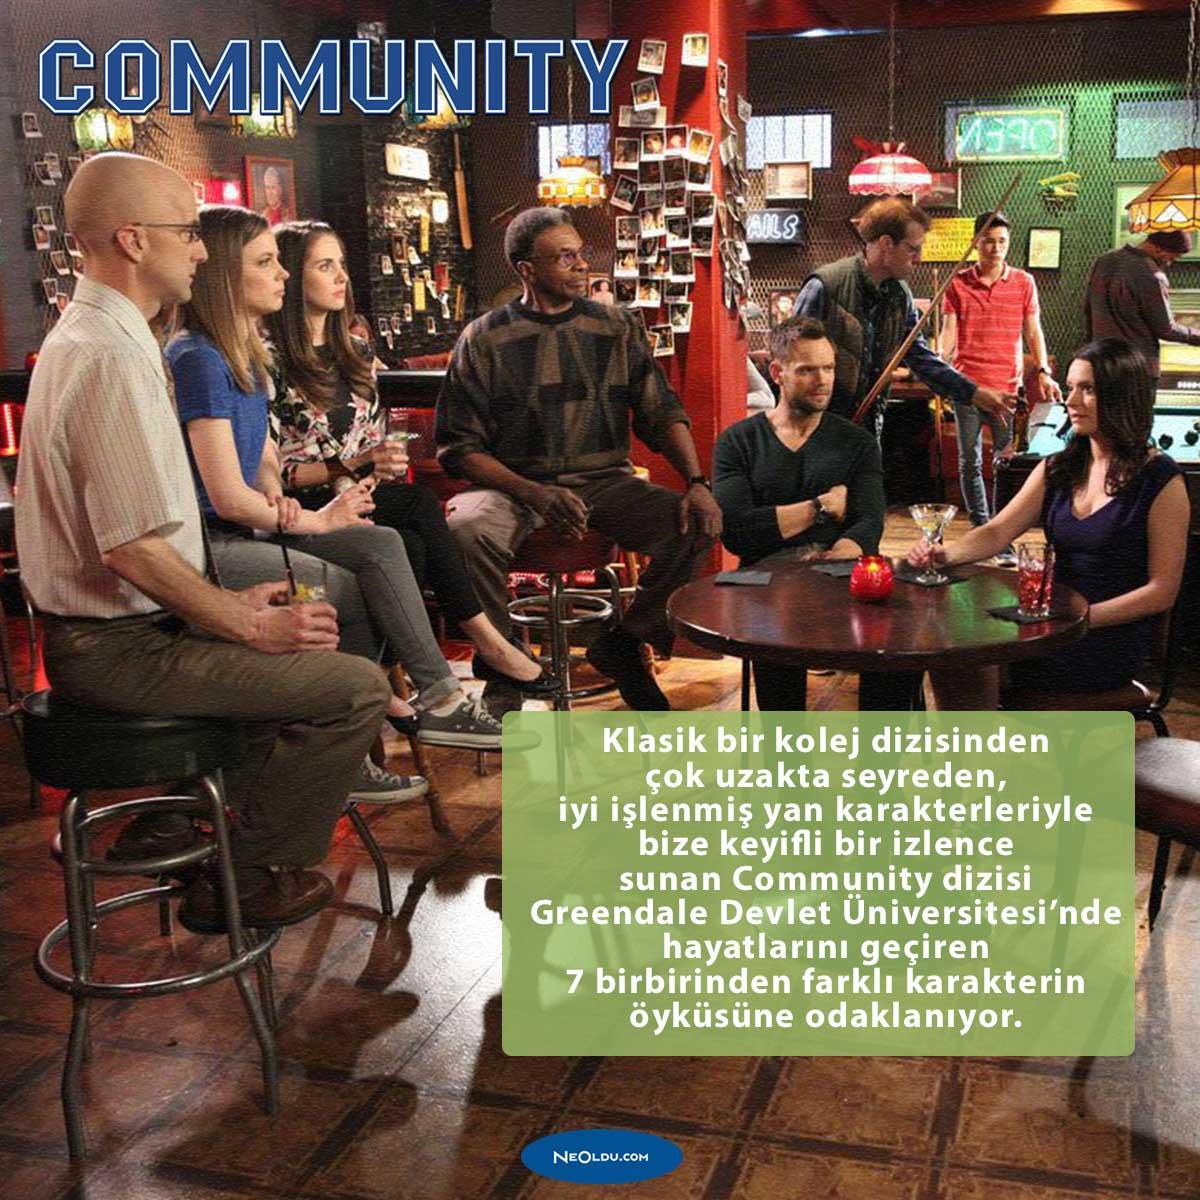 community-dizisi.jpg